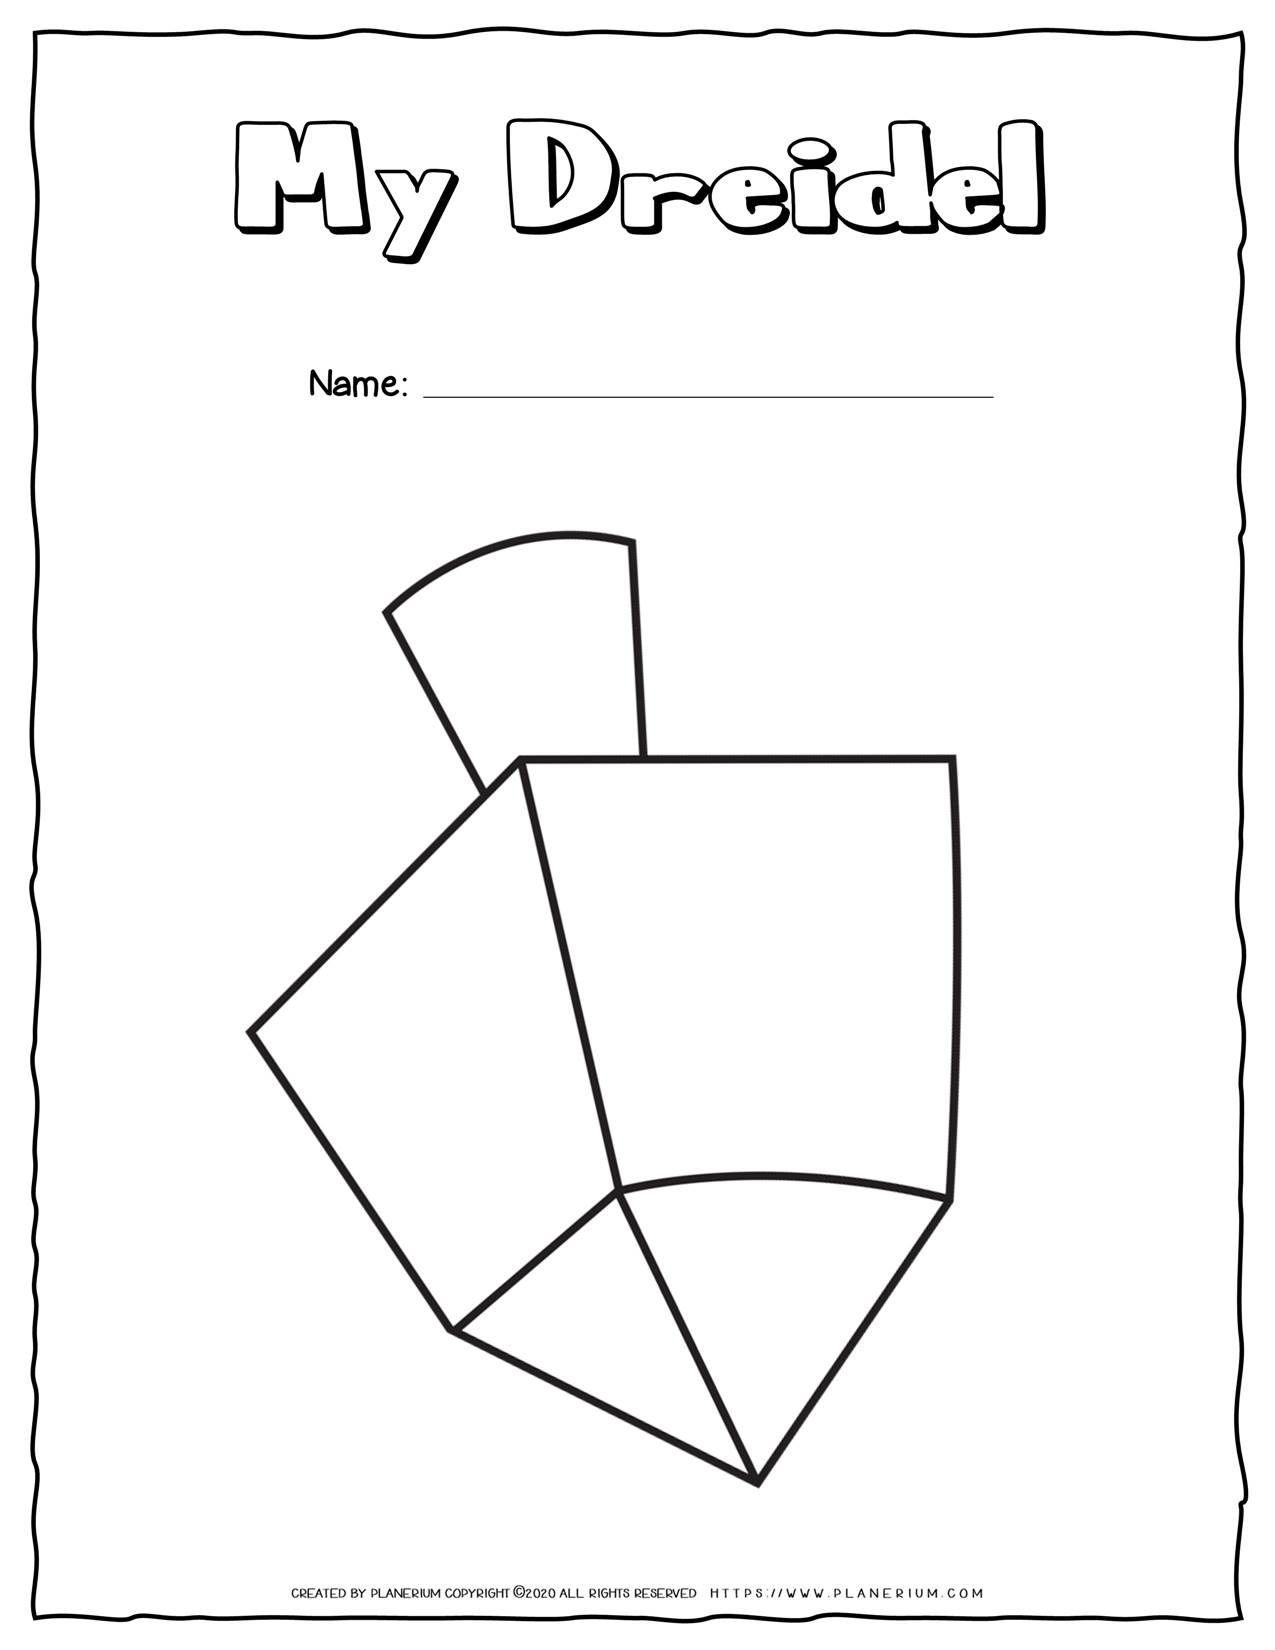 My Dreidel Coloring Page Free Printable Planerium Coloring Pages Dreidel Free Coloring Pages [ 1650 x 1275 Pixel ]